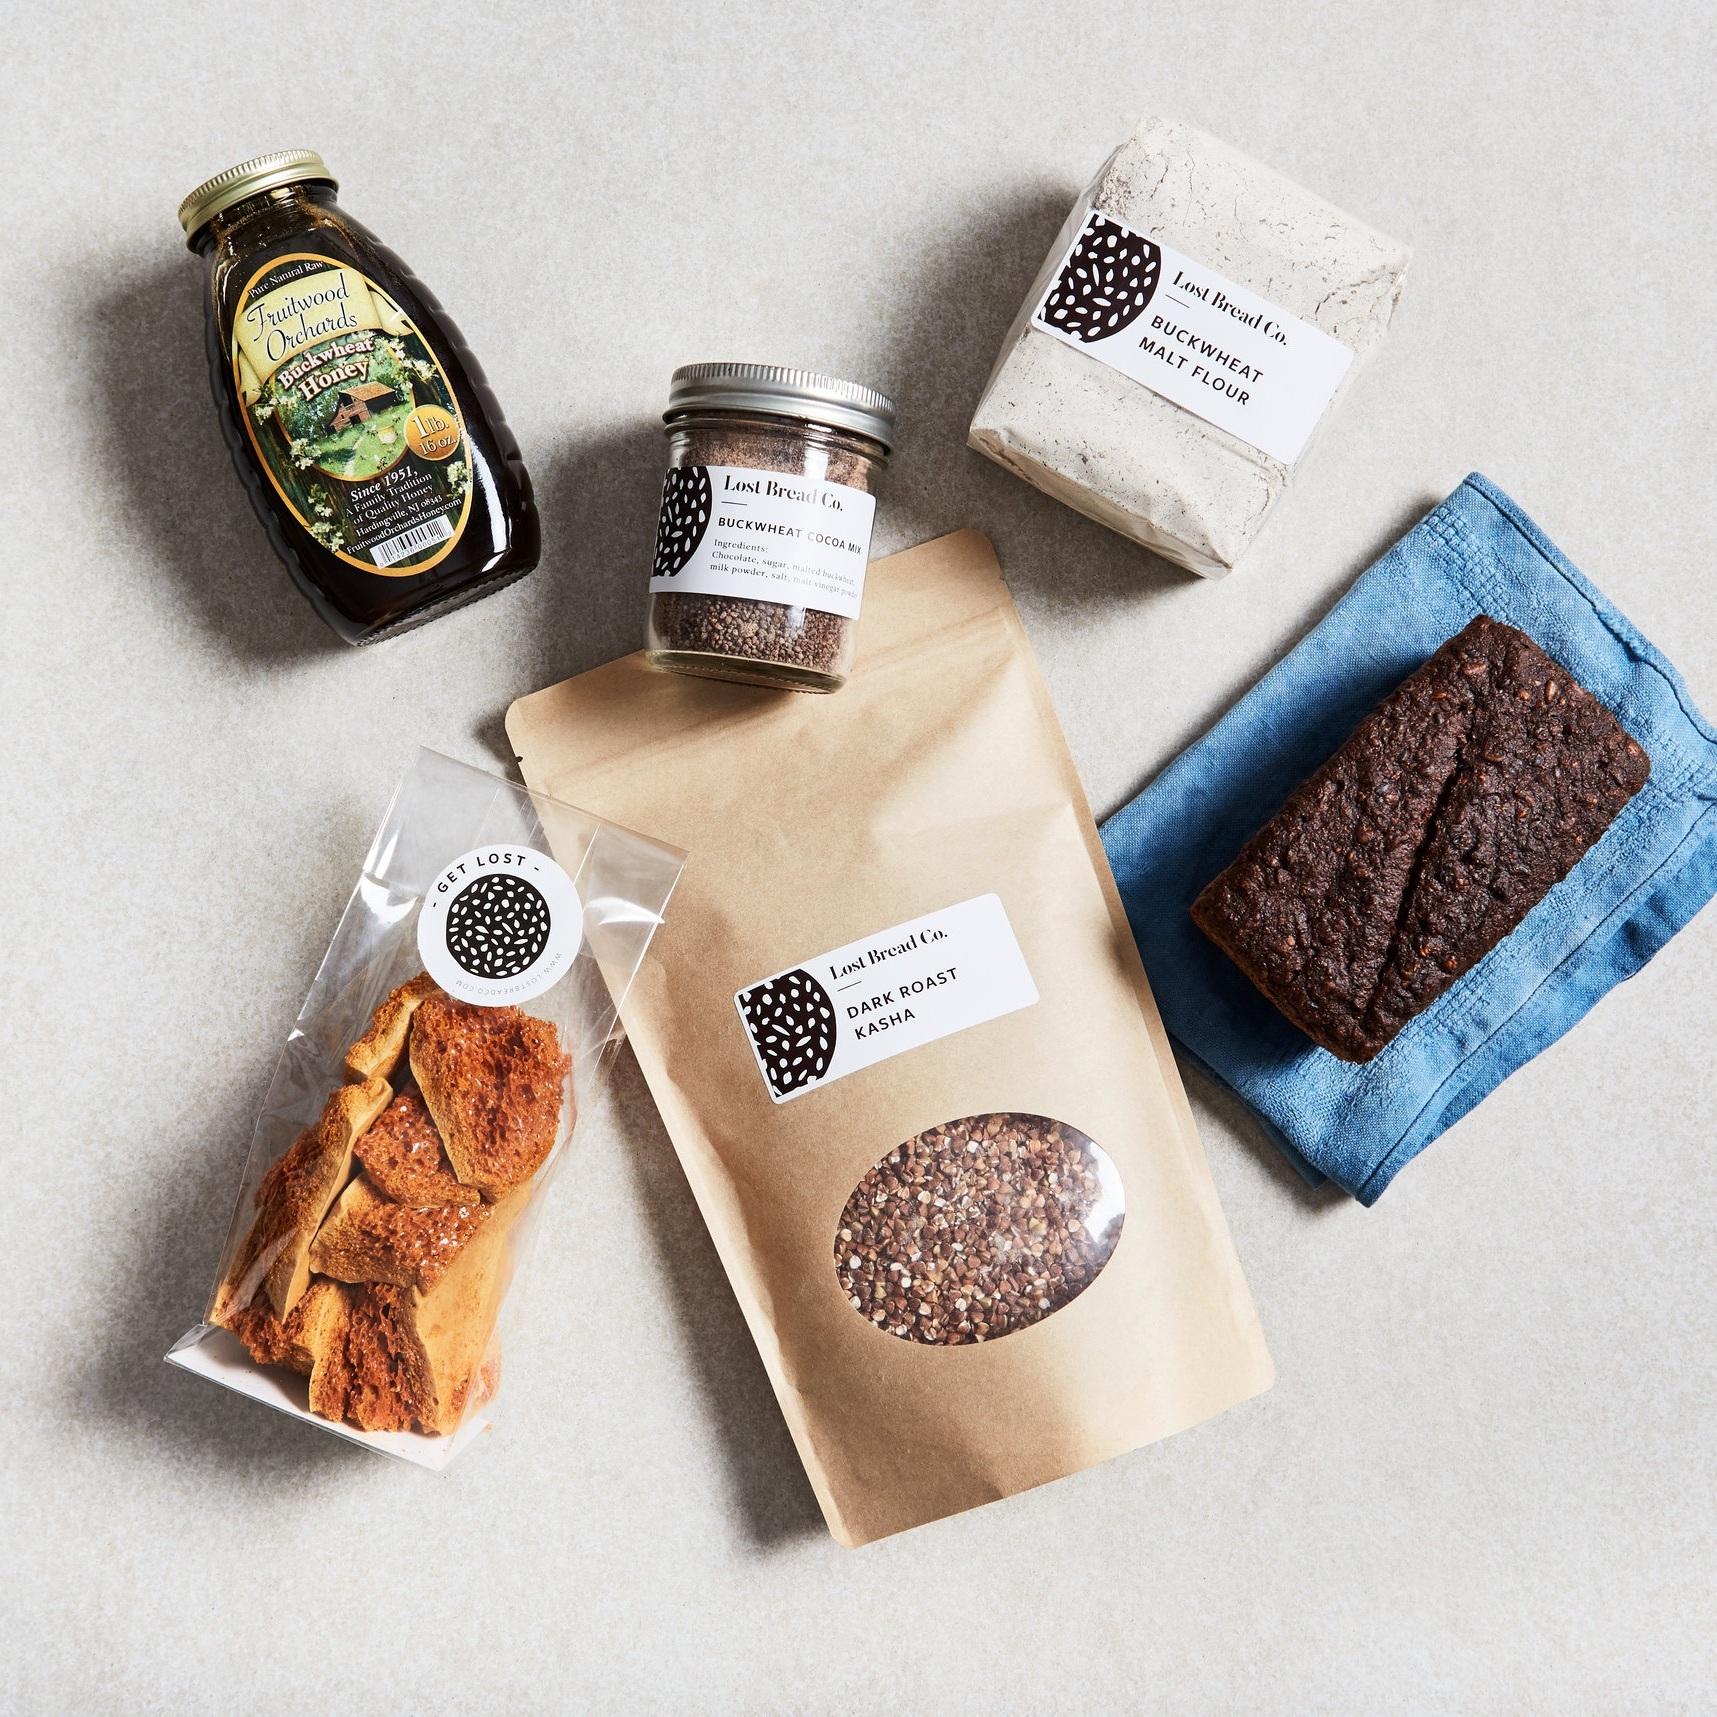 Pantry Goods  Whole grains, fresh flour, pastas & creations that'll keep.  Examples above: Dark roast kasha, buckwheat hot chocolate mix, olive cacao buckornbrot, buckwheat honey